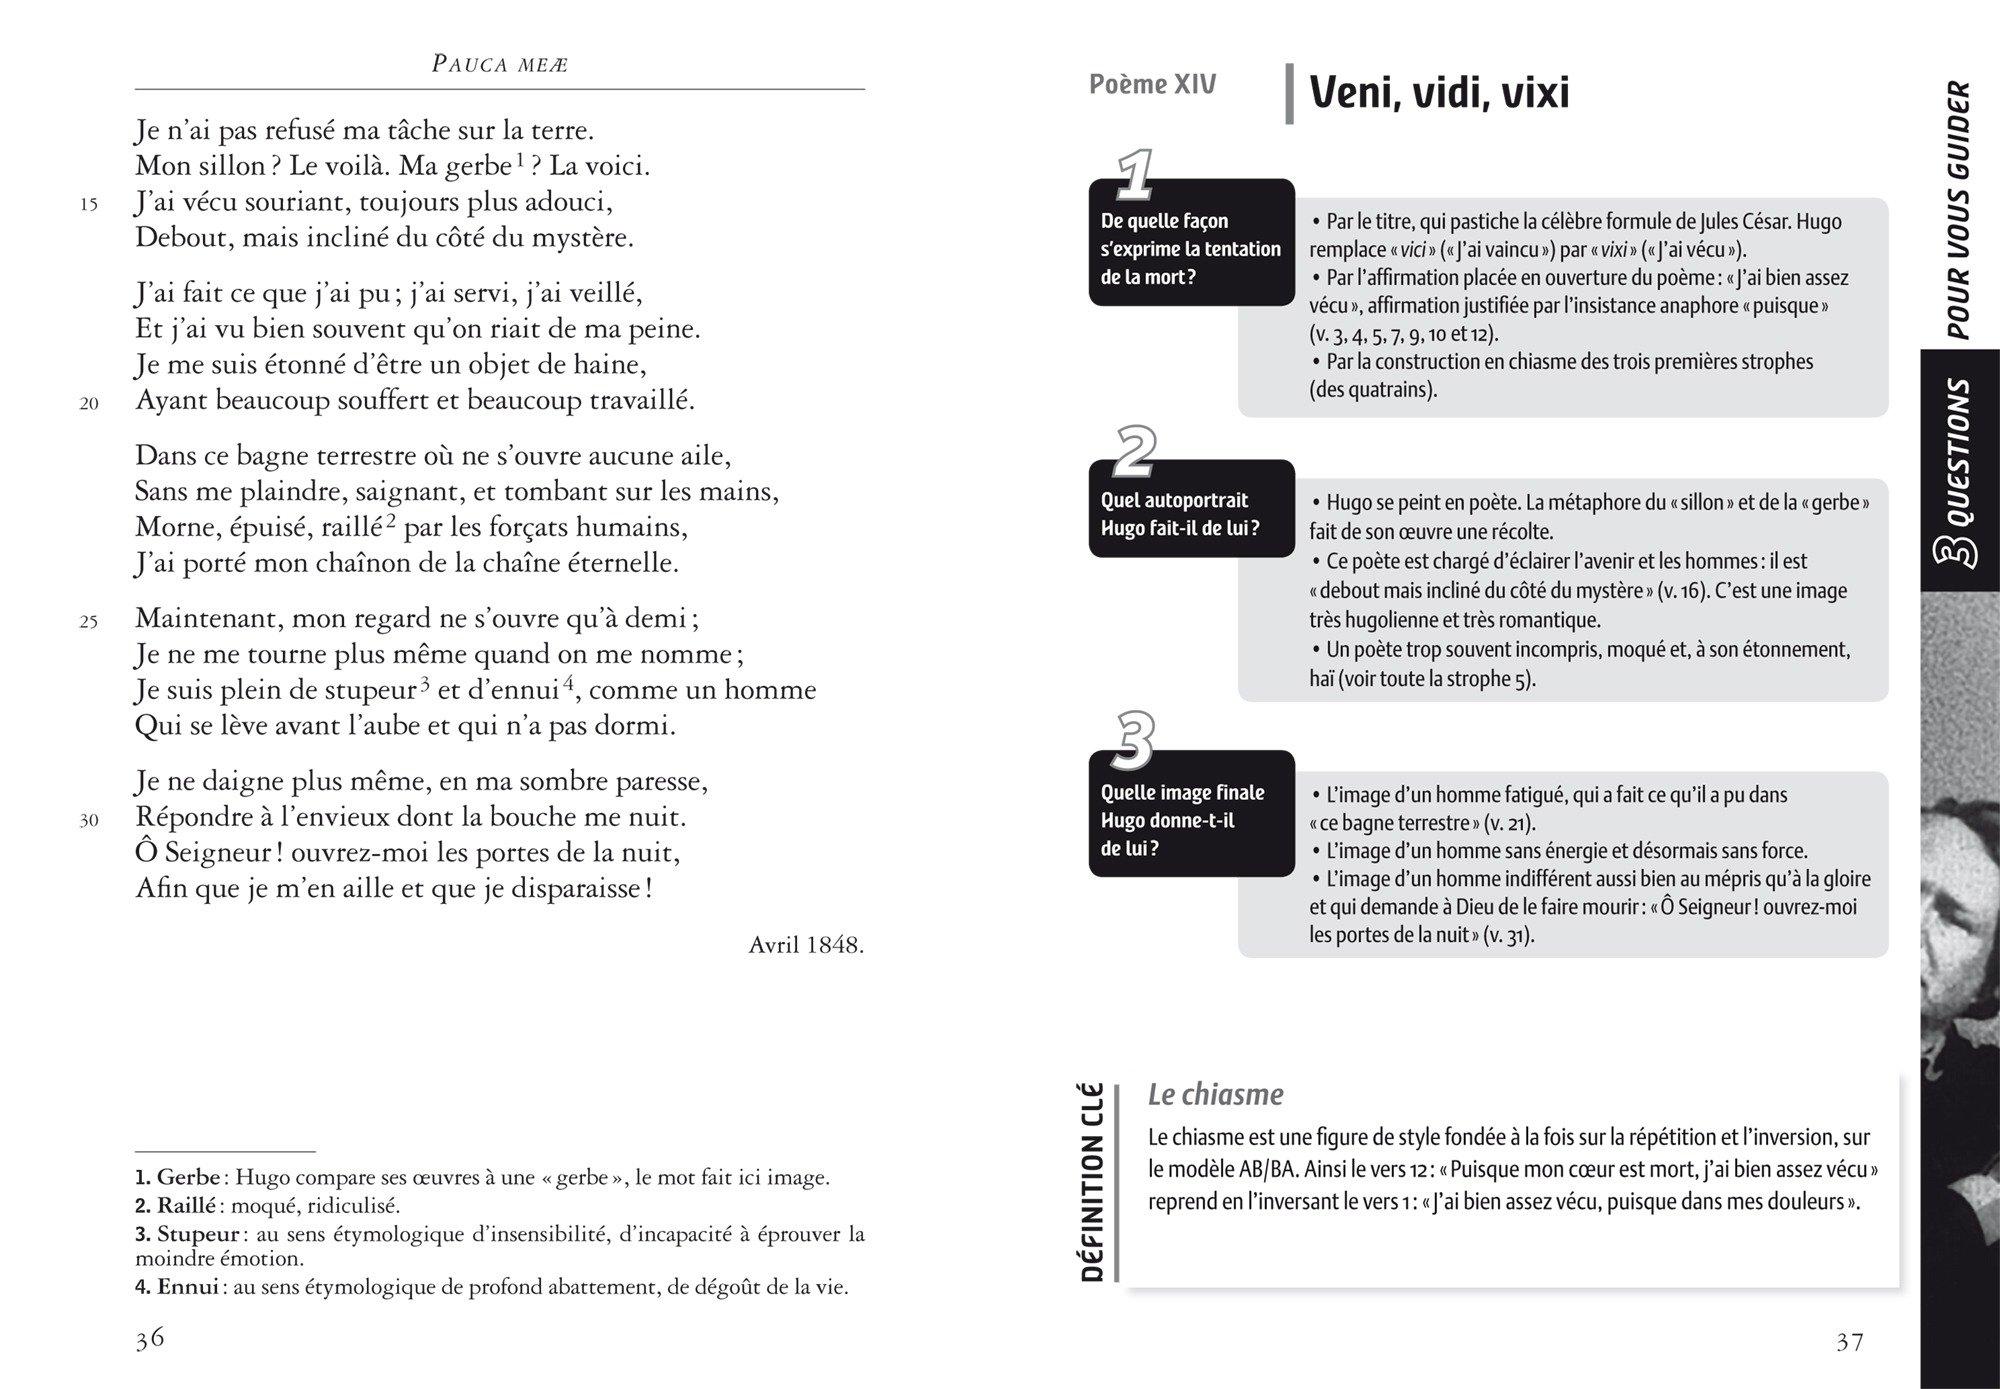 poeme 9 pauca meae